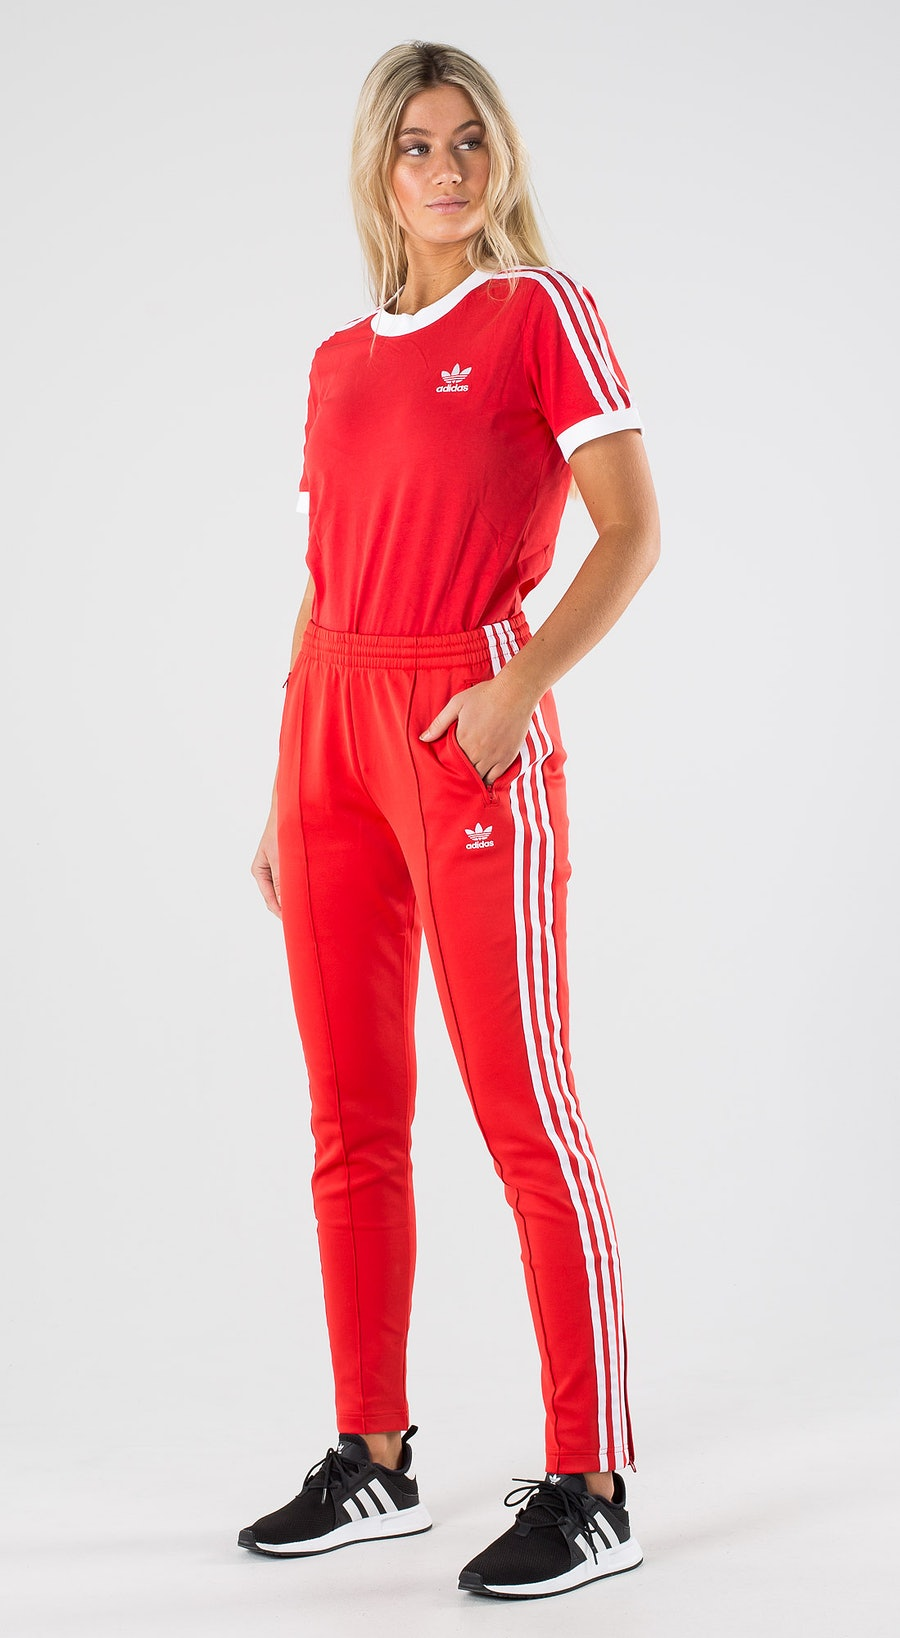 Adidas Originals 3 Stripe Tee Lush Red White Outfit Multi